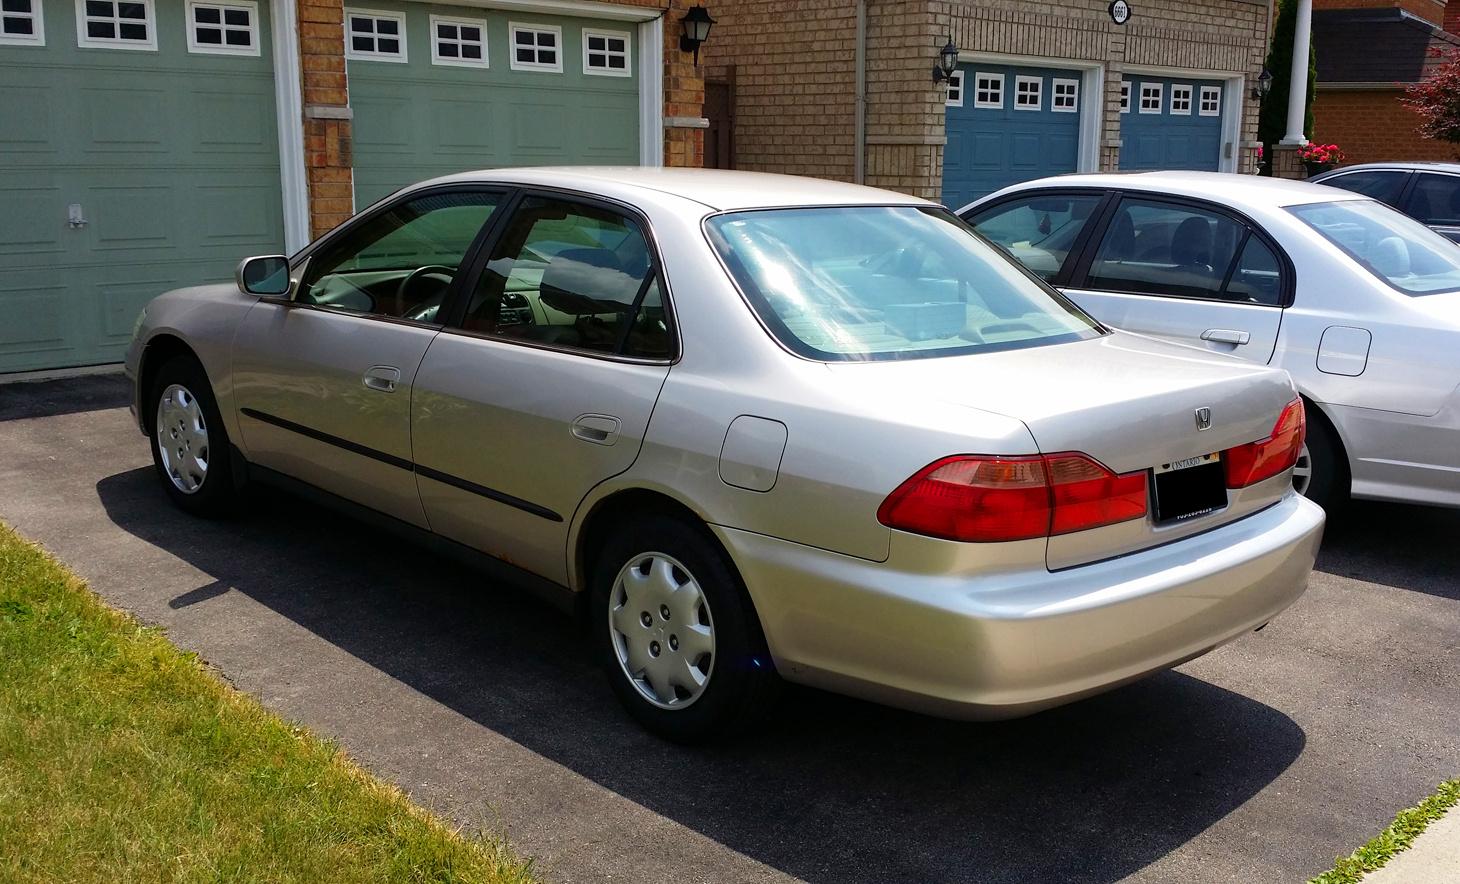 Honda Accord 2014 Coupe V6 >> 1999 Honda Accord - Pictures - CarGurus